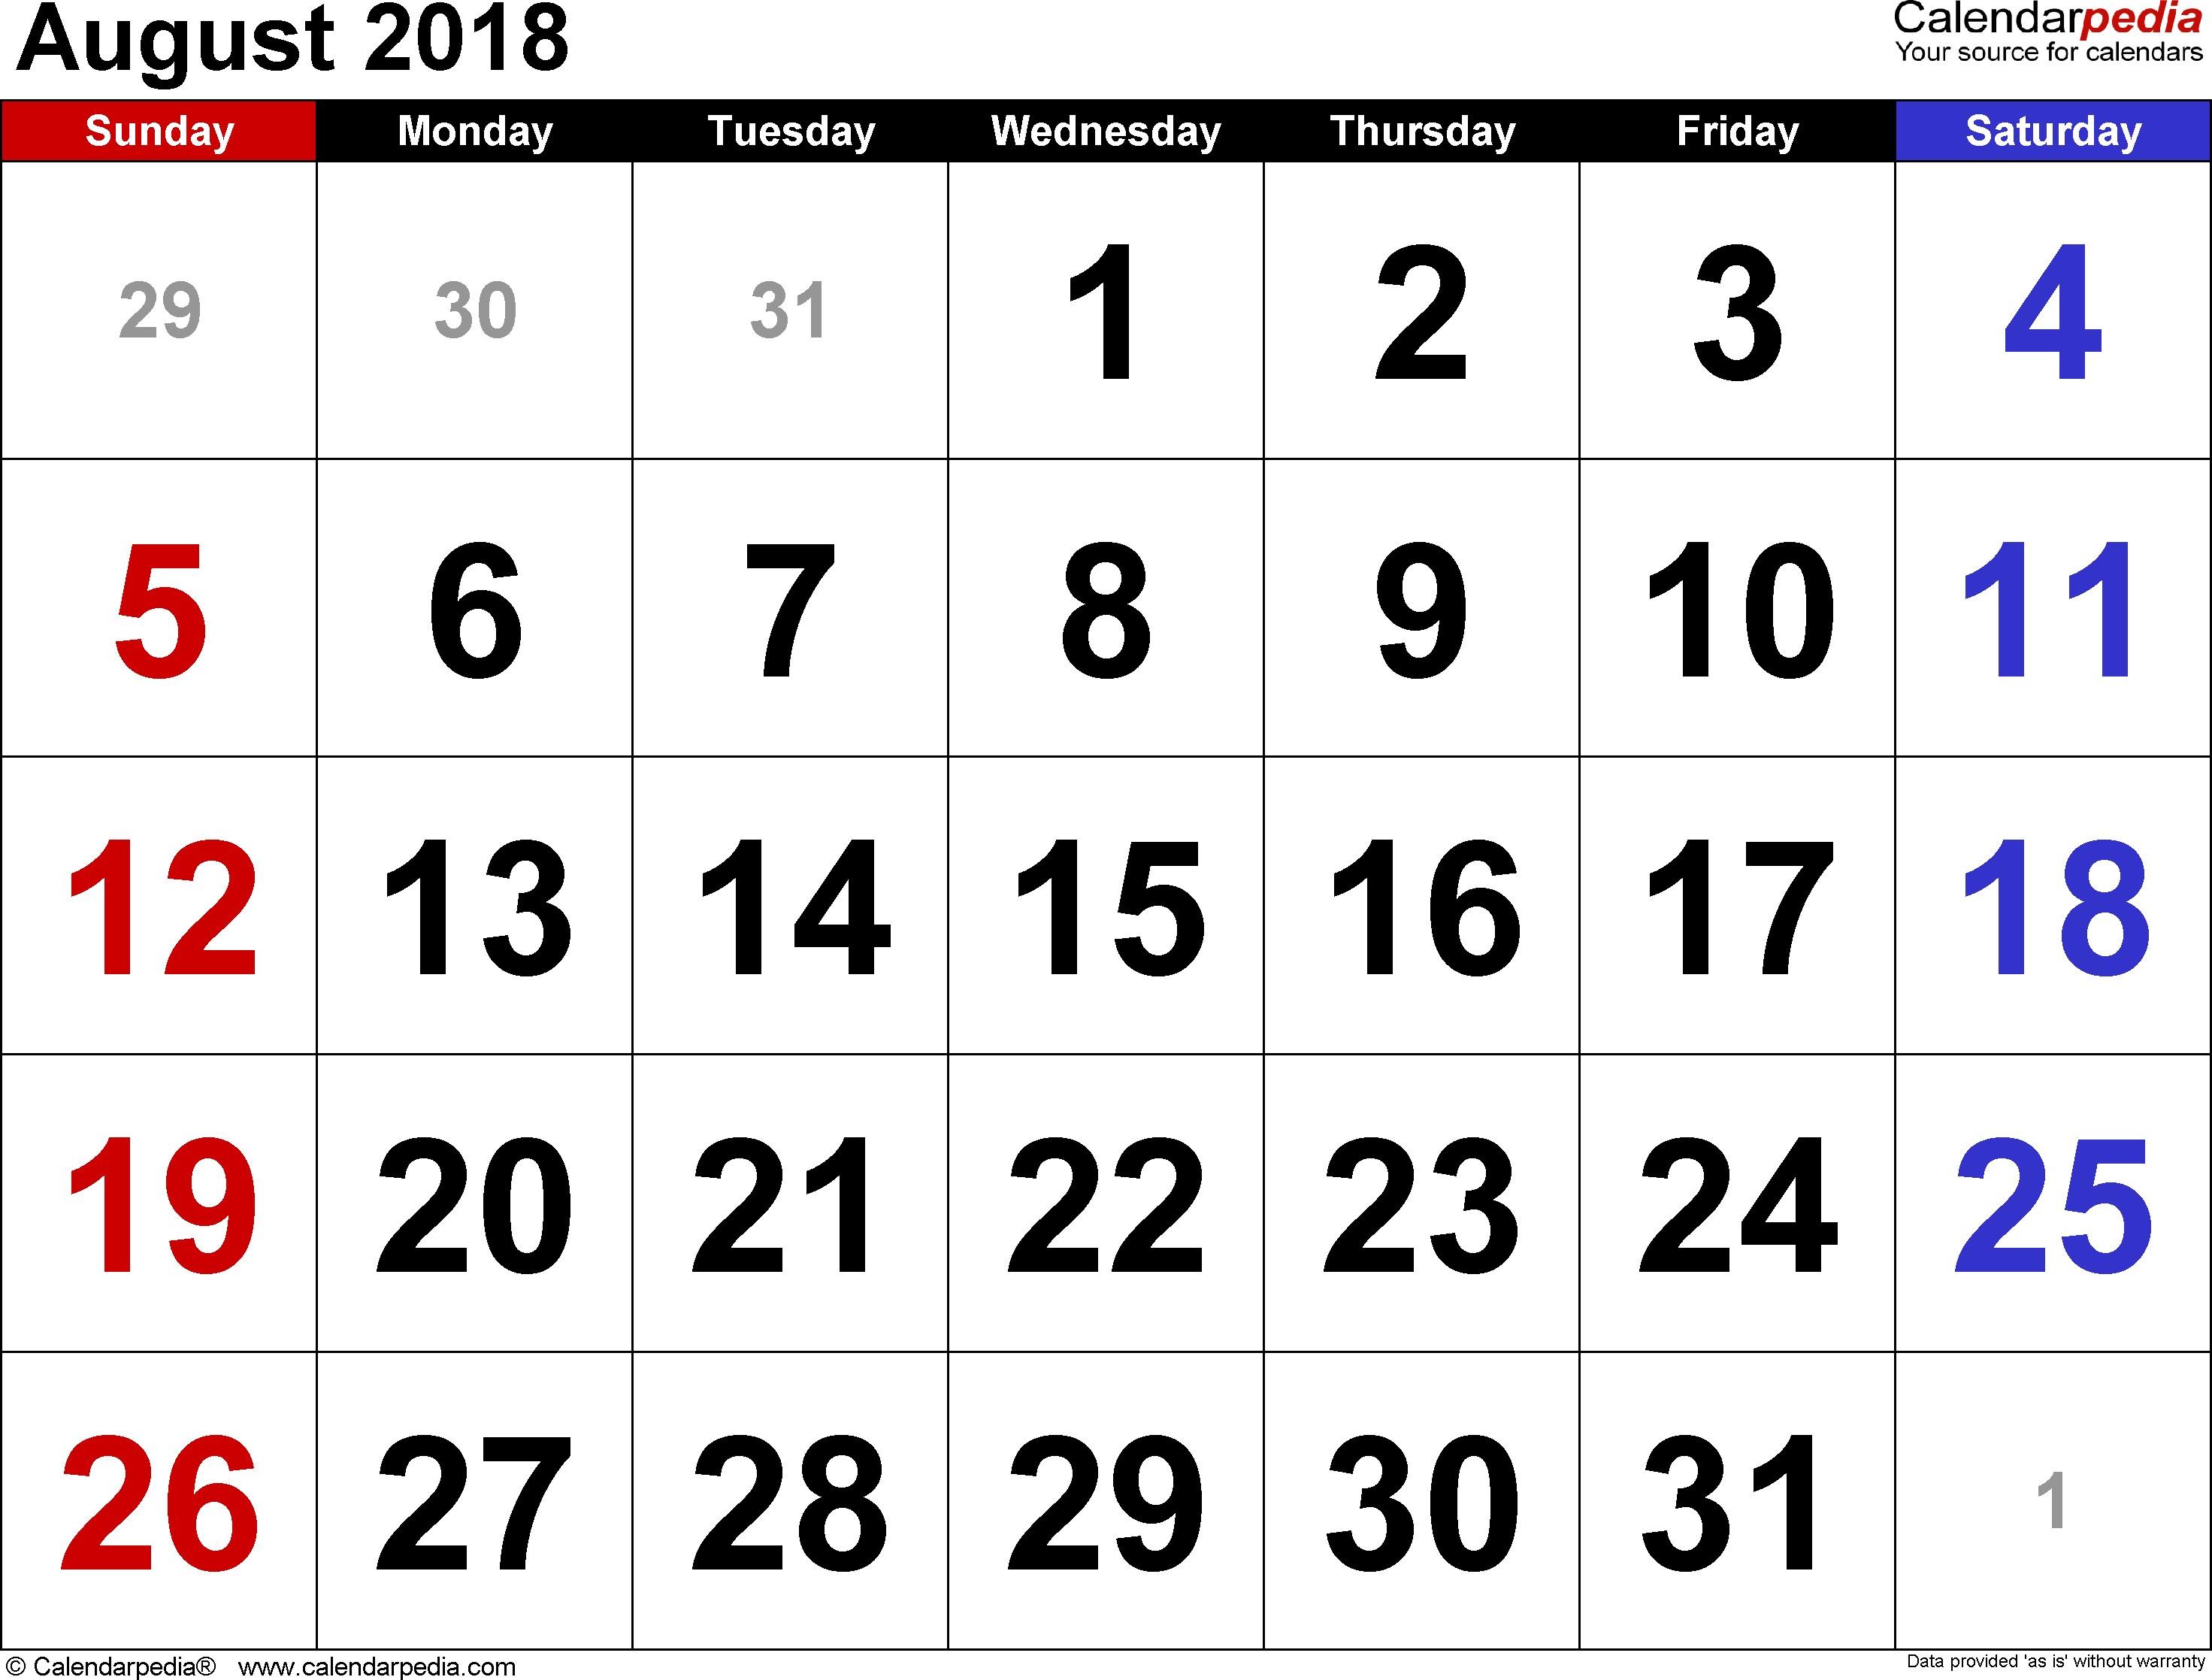 March Calendar Cute Más Caliente August 2018 Calendar August 2018 Calendar Word August 2018